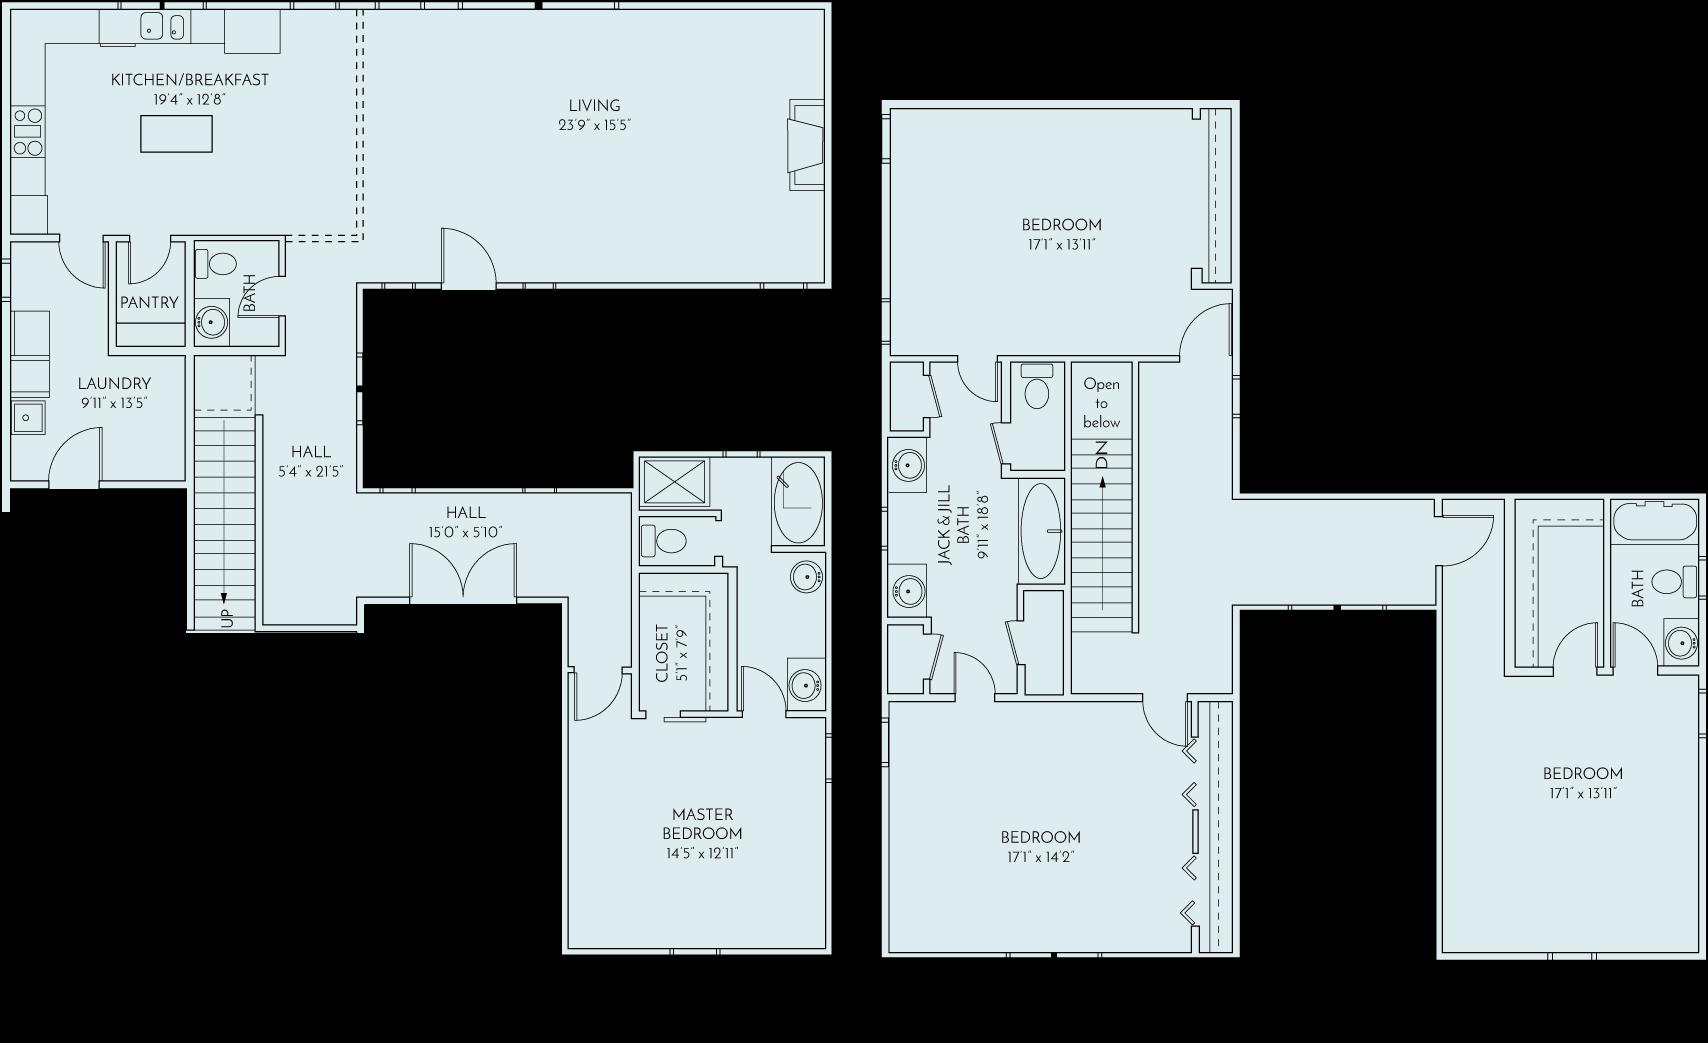 Masonboro Place Floor Plan